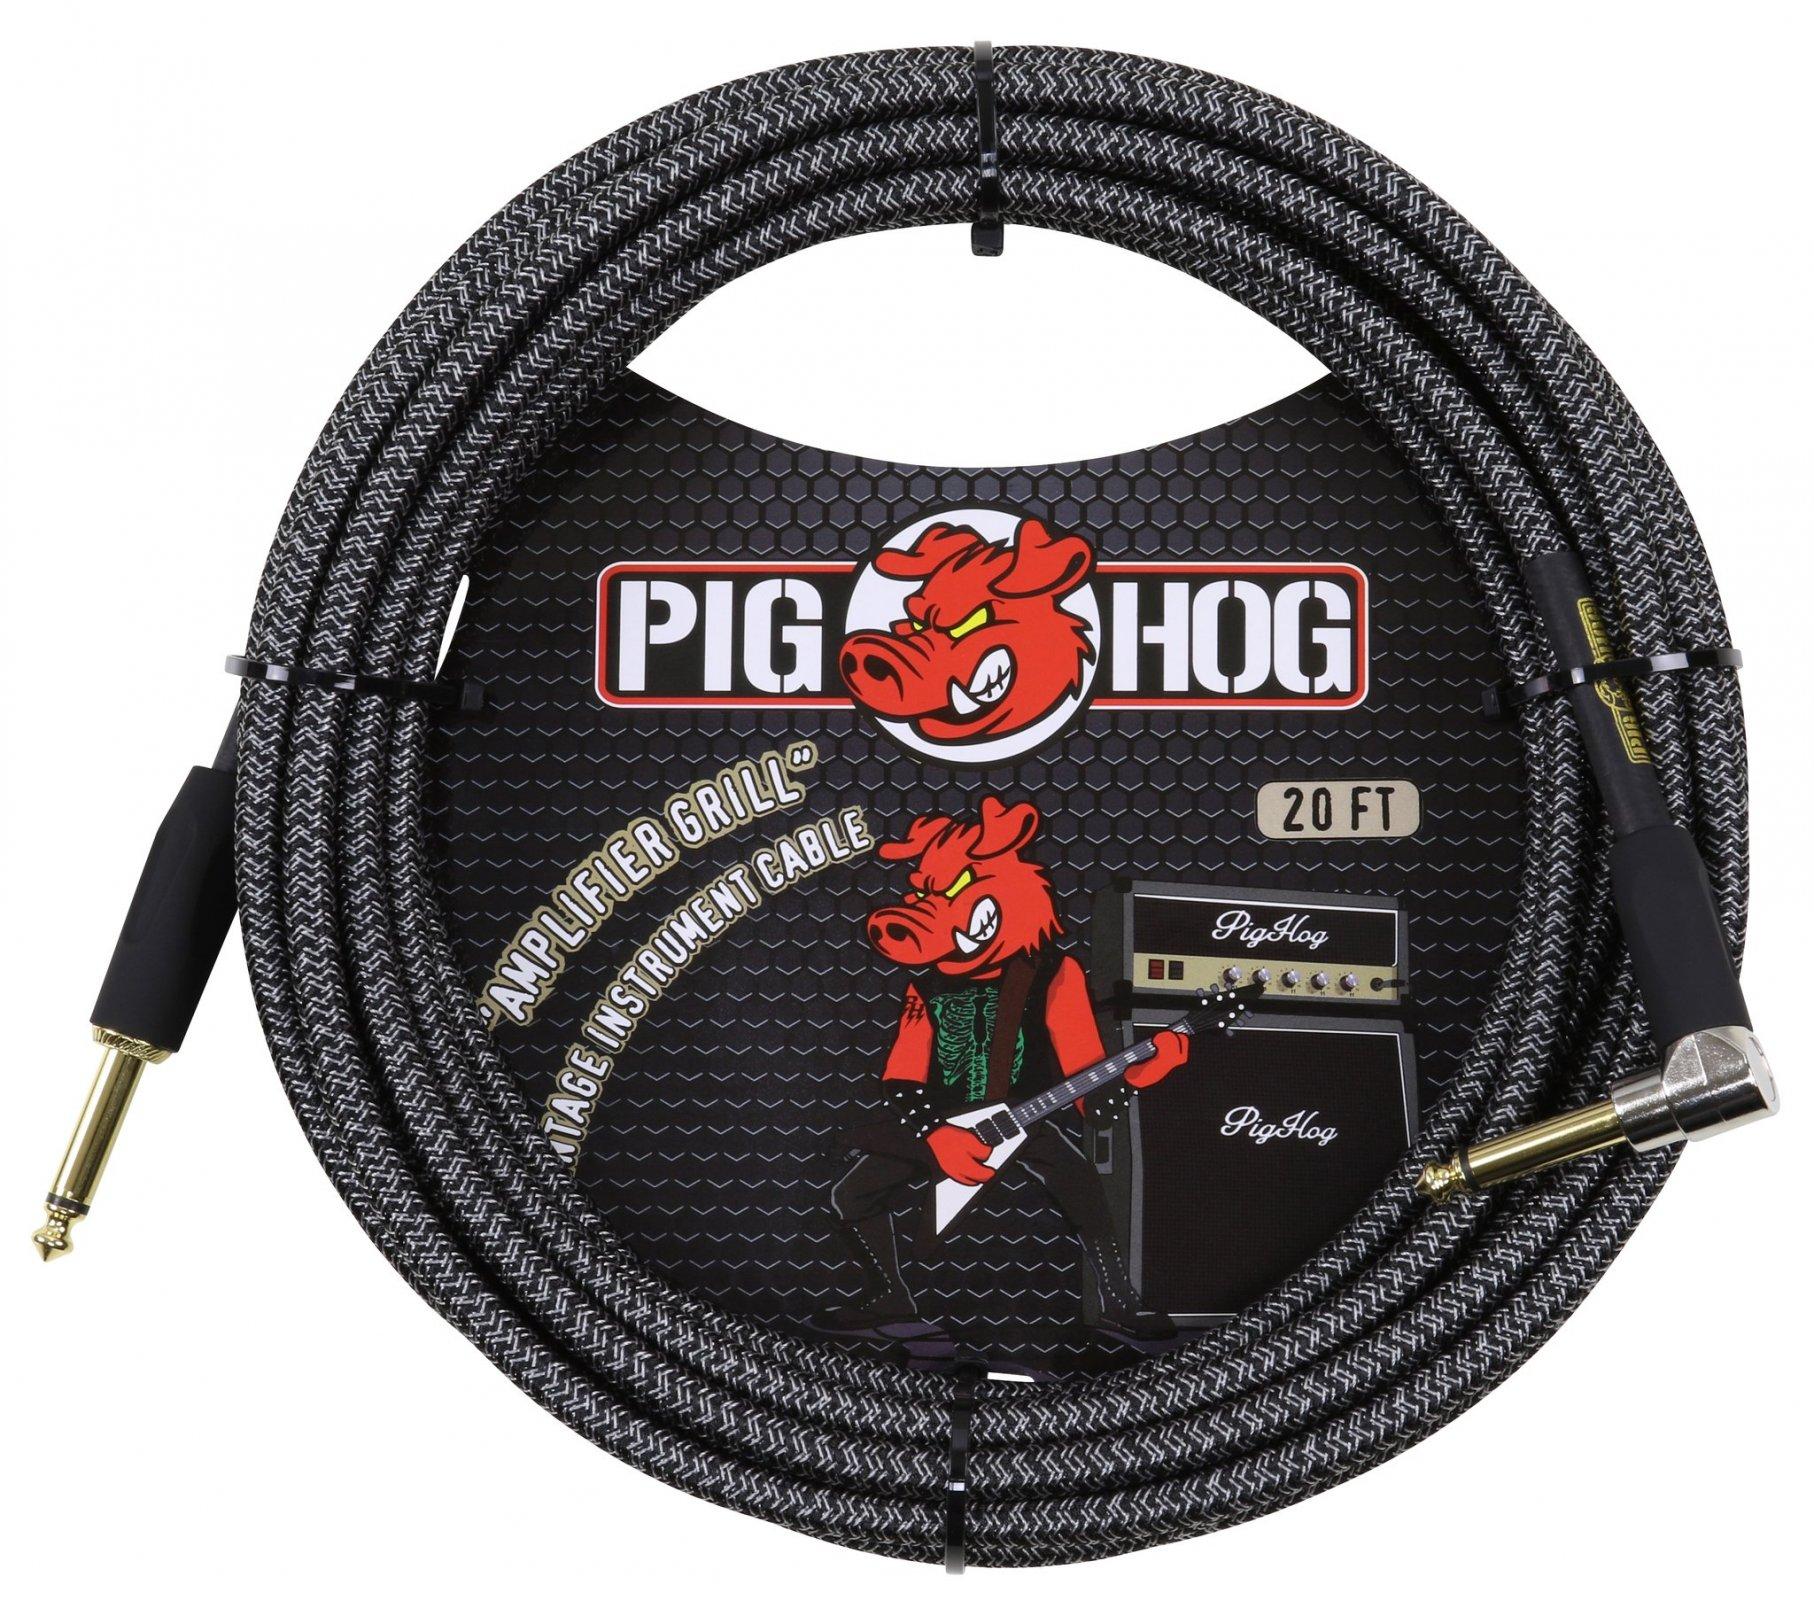 Pig Hog Instrument RA 20Ft